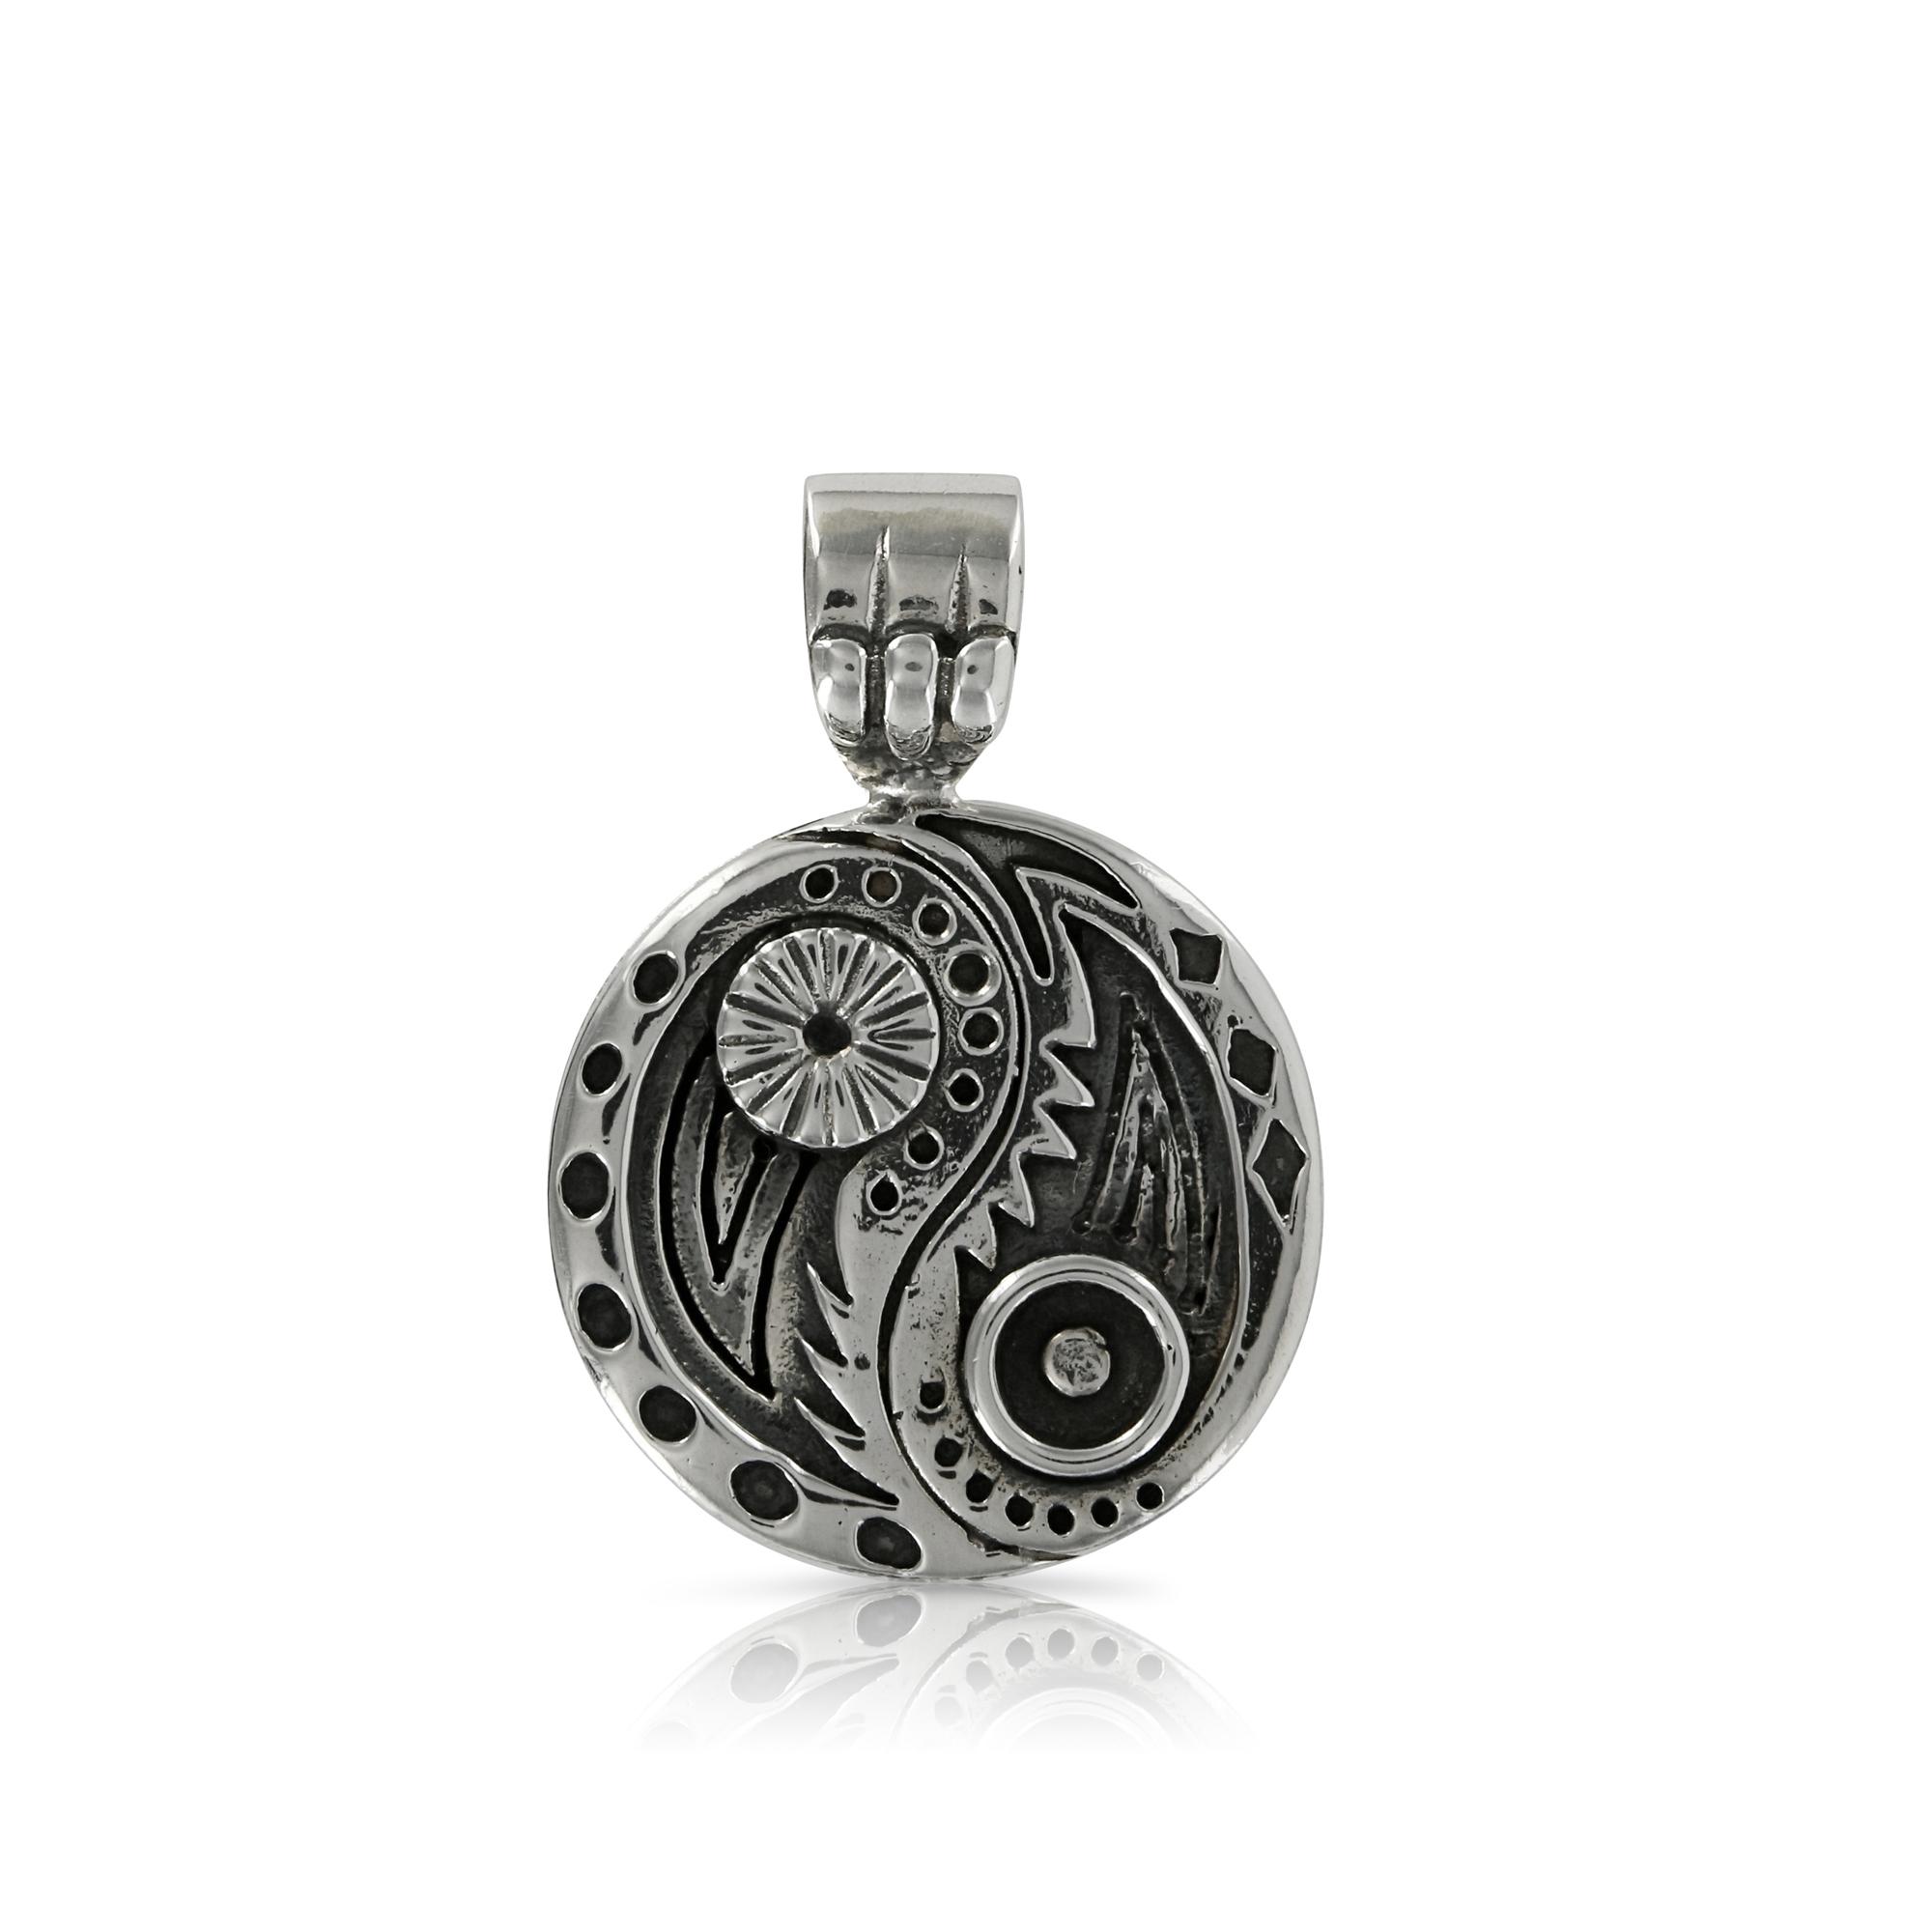 Silver yin yang pendant prey jewellery silver yin yang pendant by prey jewellery aloadofball Choice Image